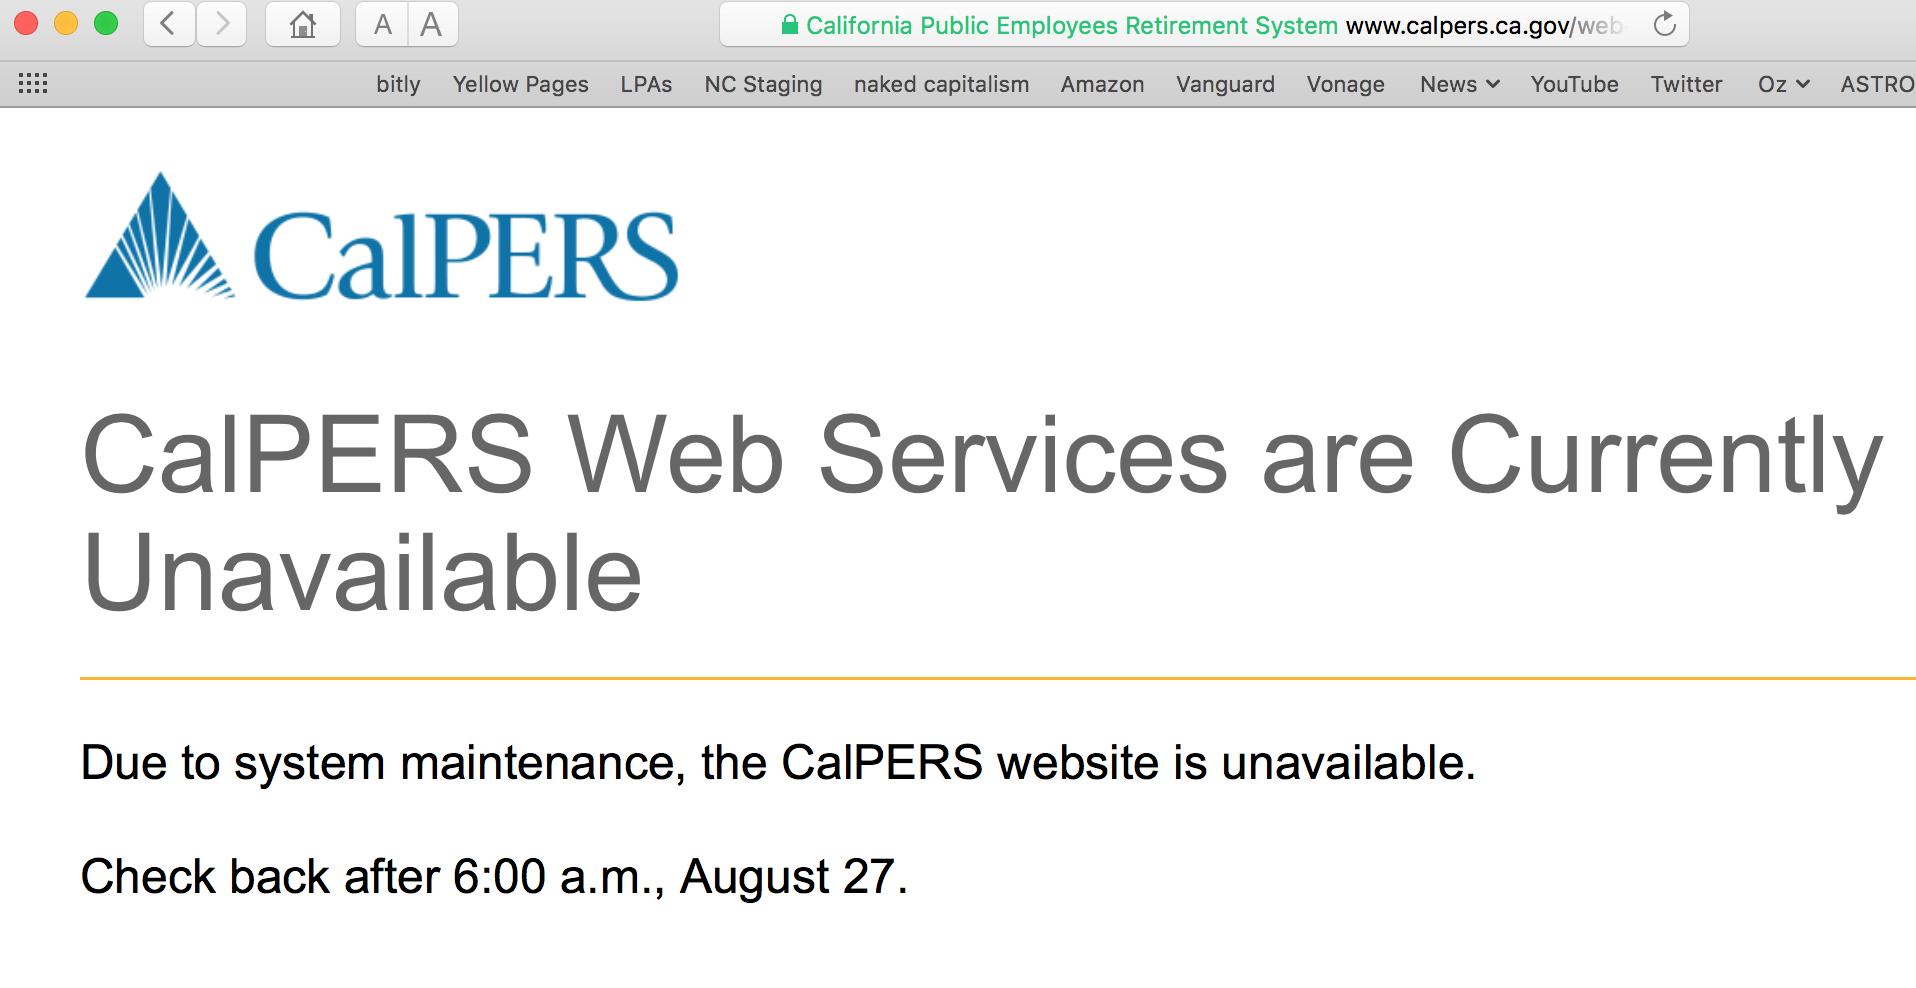 Marcie Frost's Poor Job as CalPERS CEO –